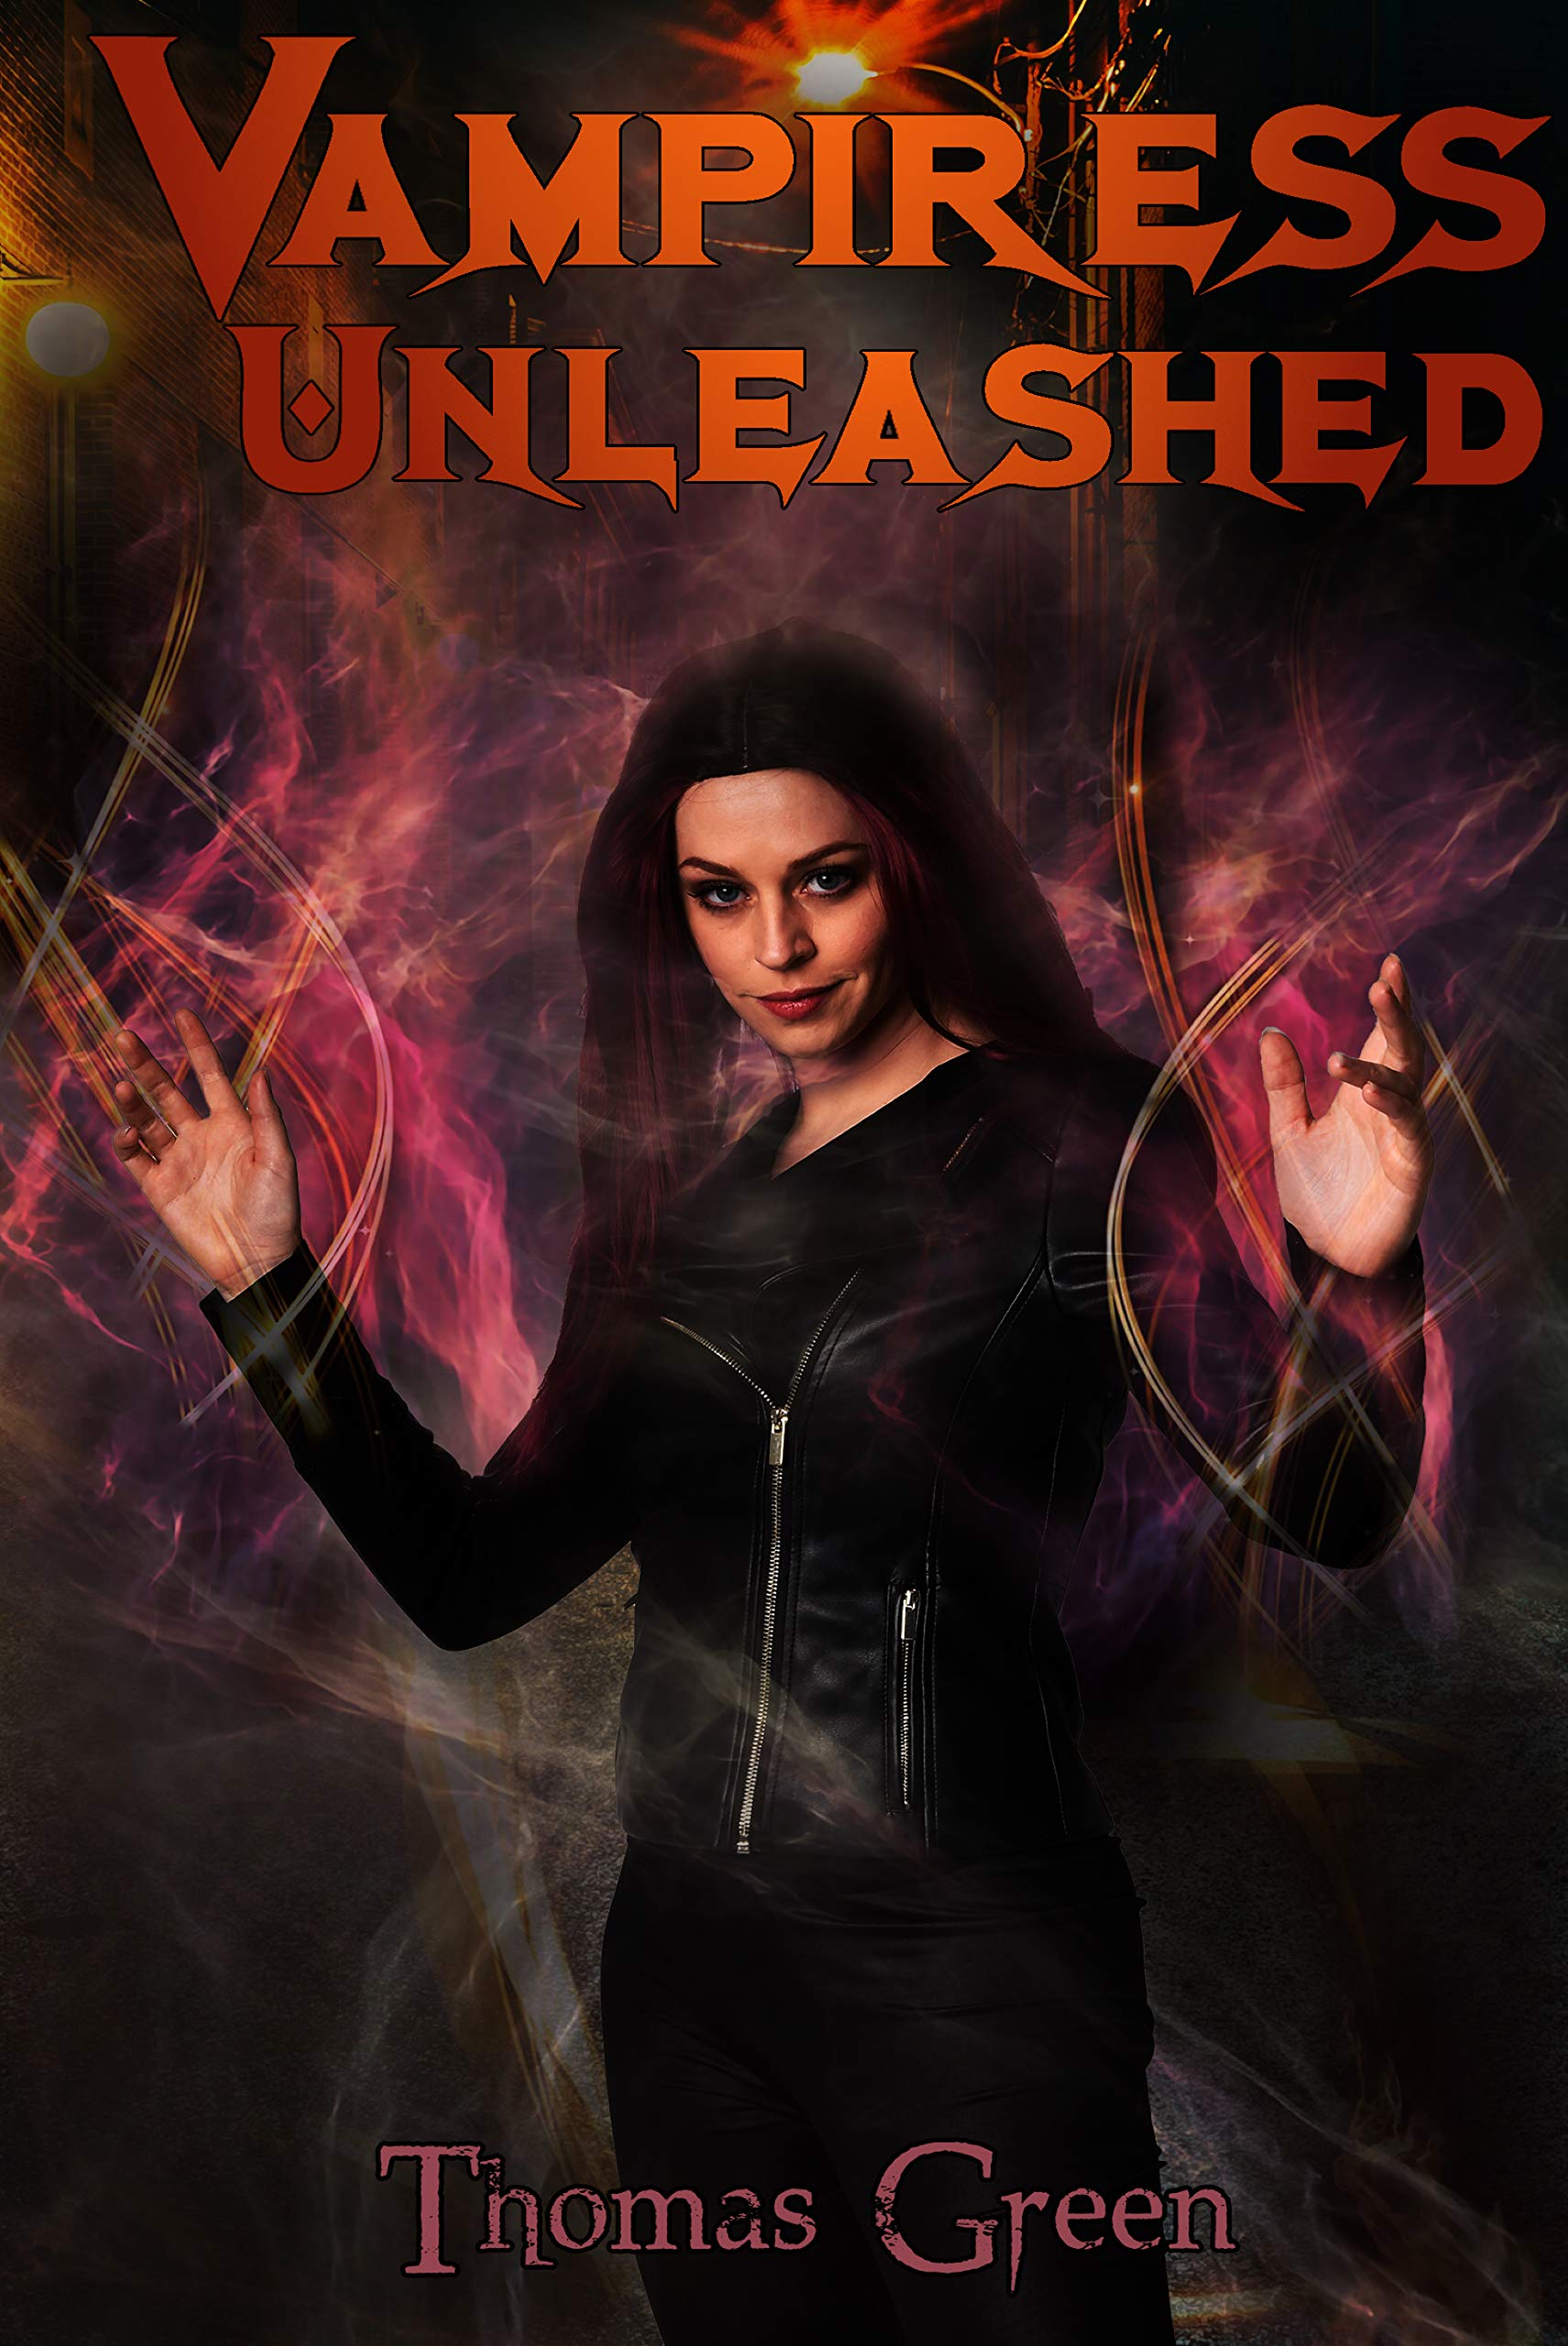 Vampiress Unleashed